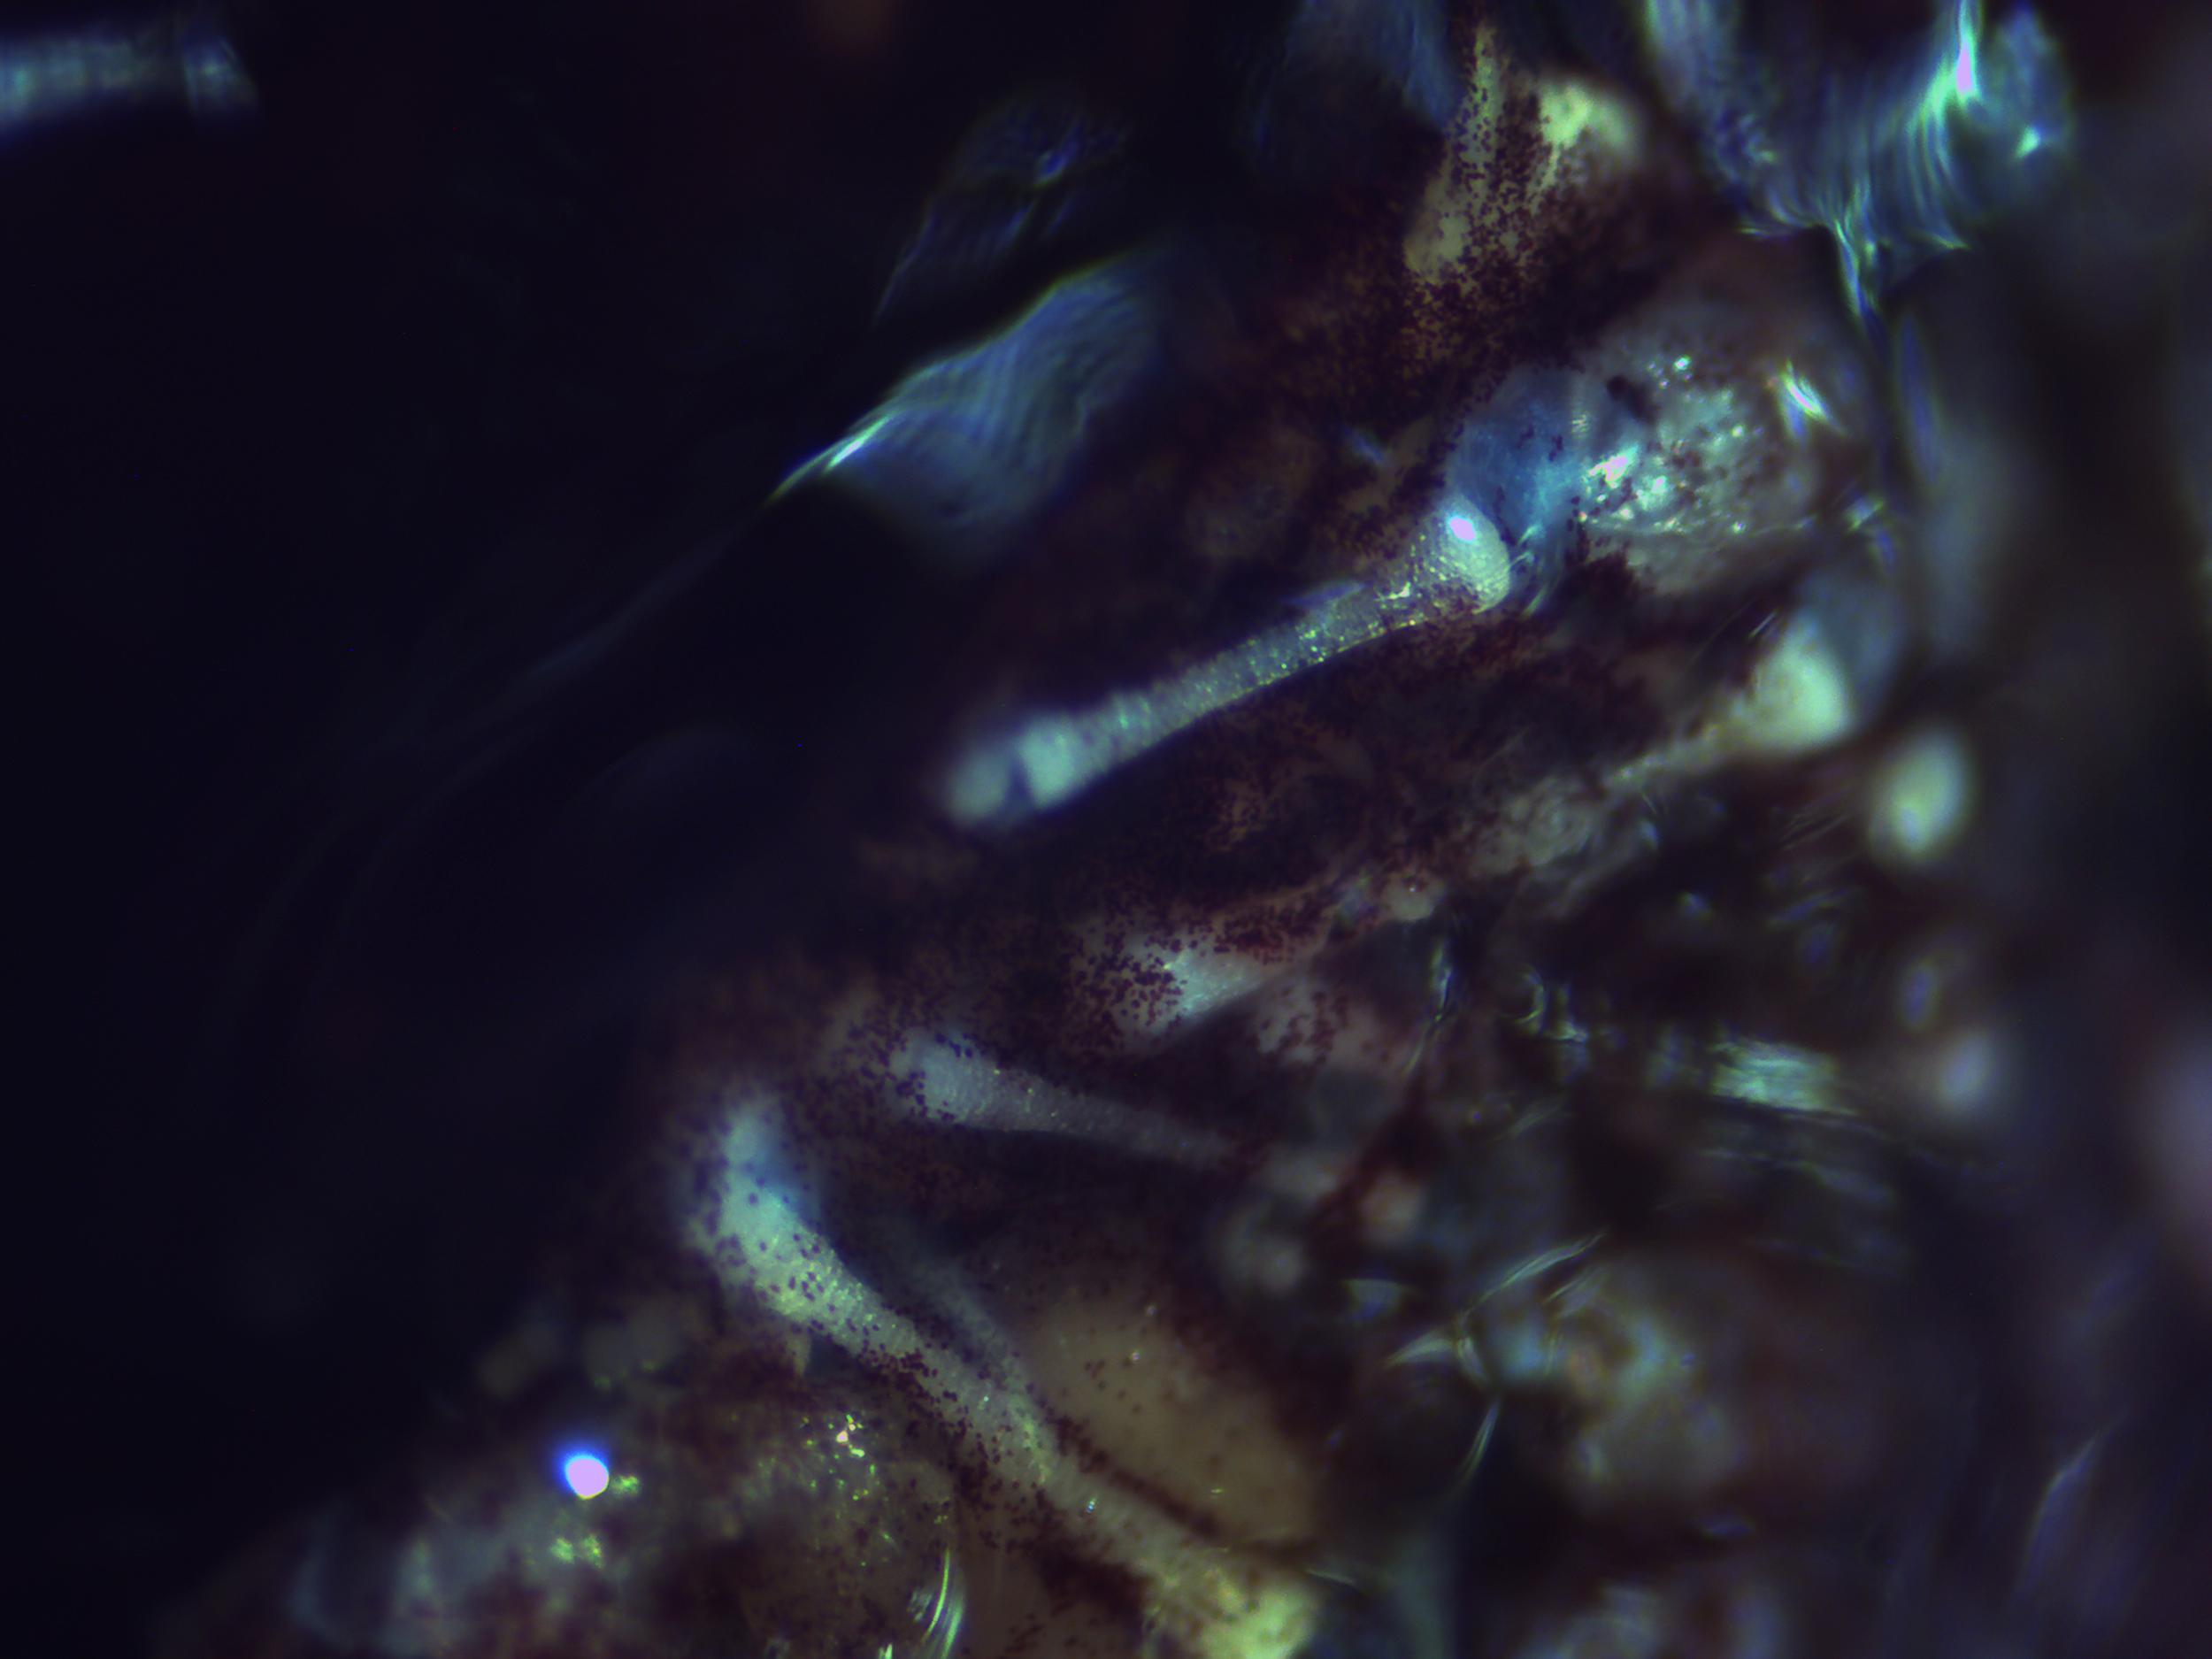 Sea Urchin image